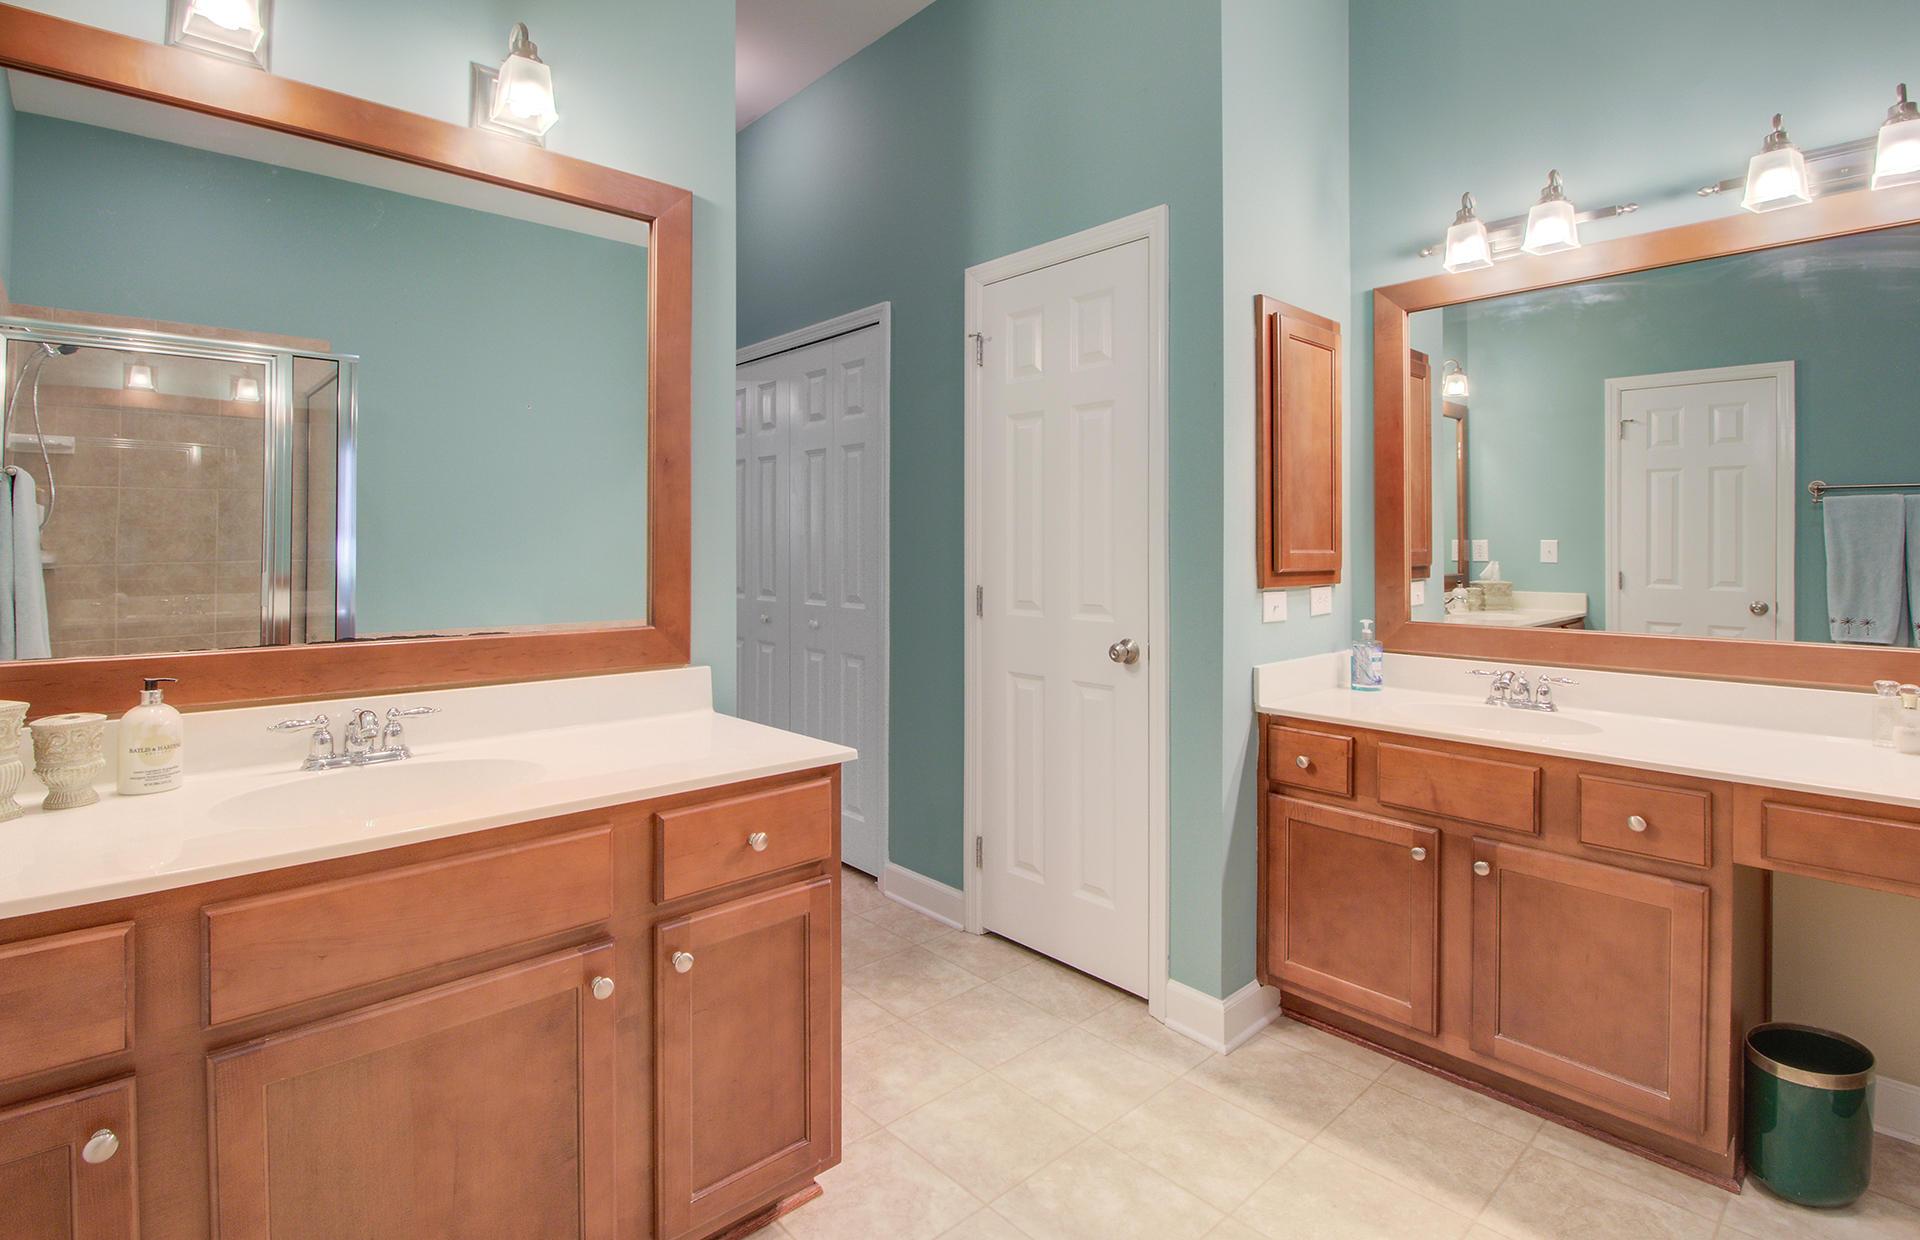 Dunes West Homes For Sale - 145 Fresh Meadow, Mount Pleasant, SC - 23